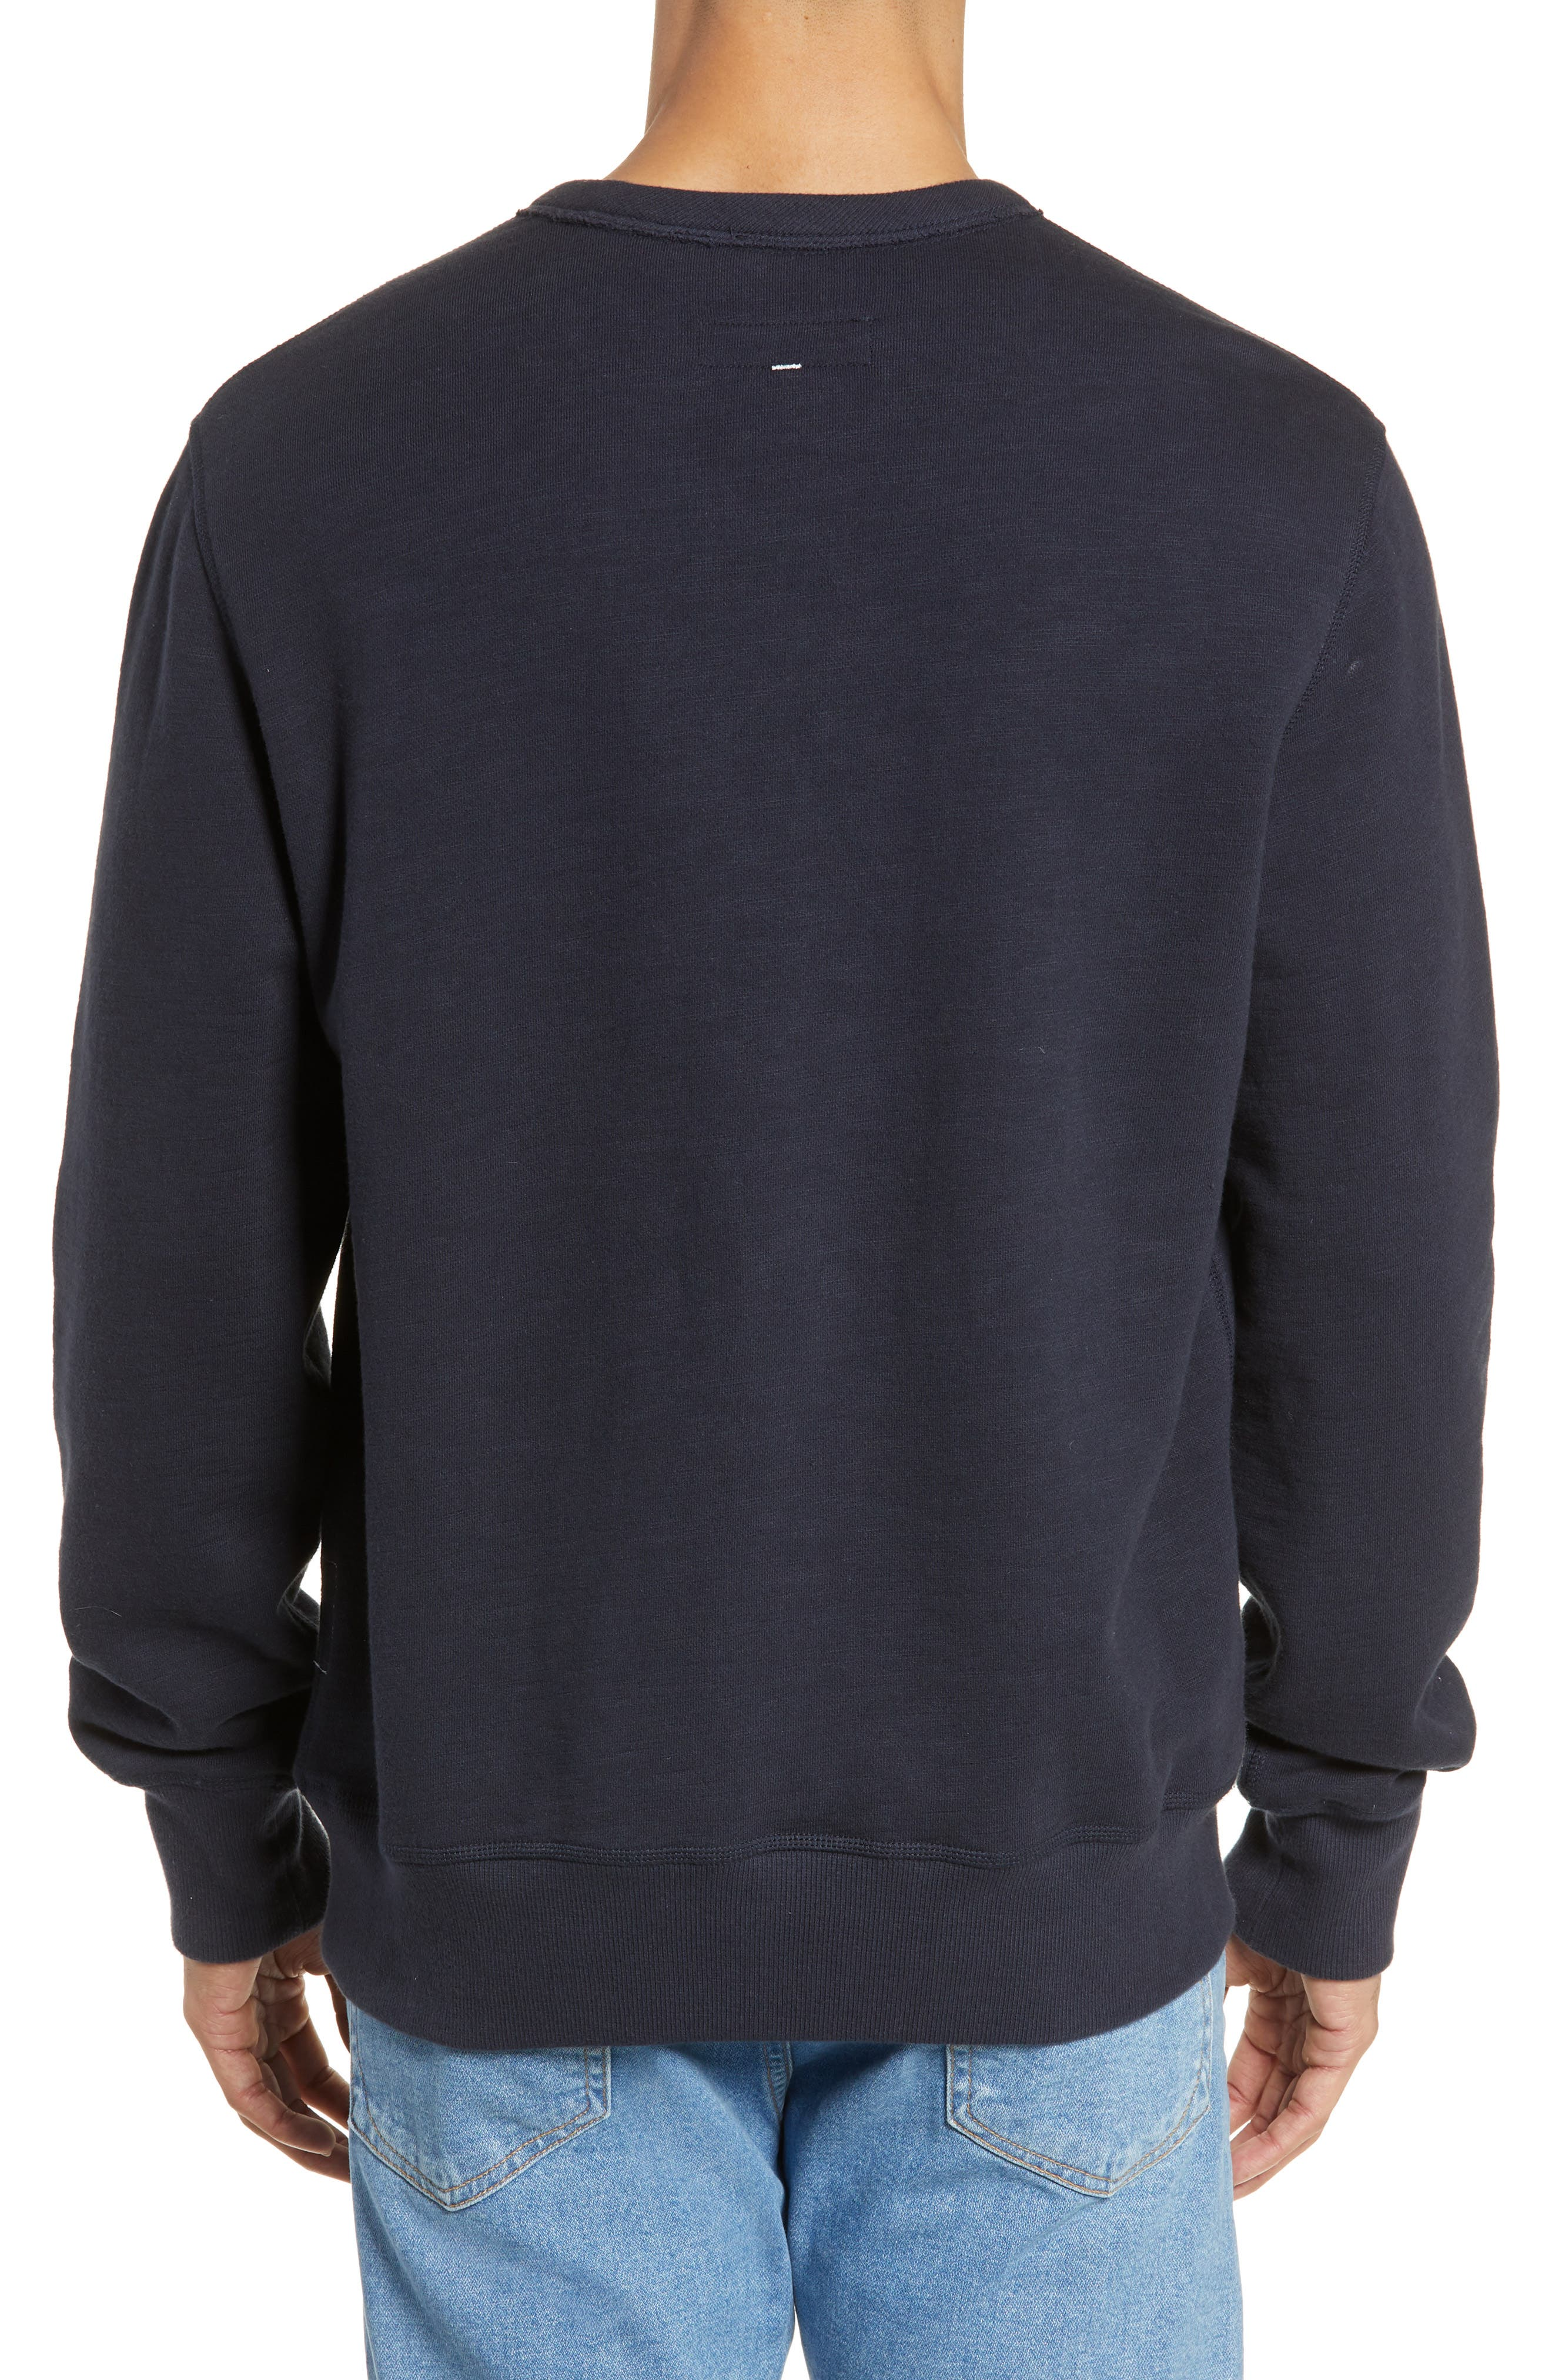 RAG & BONE, Graphic Embroidered Sweatshirt, Alternate thumbnail 2, color, NAVY